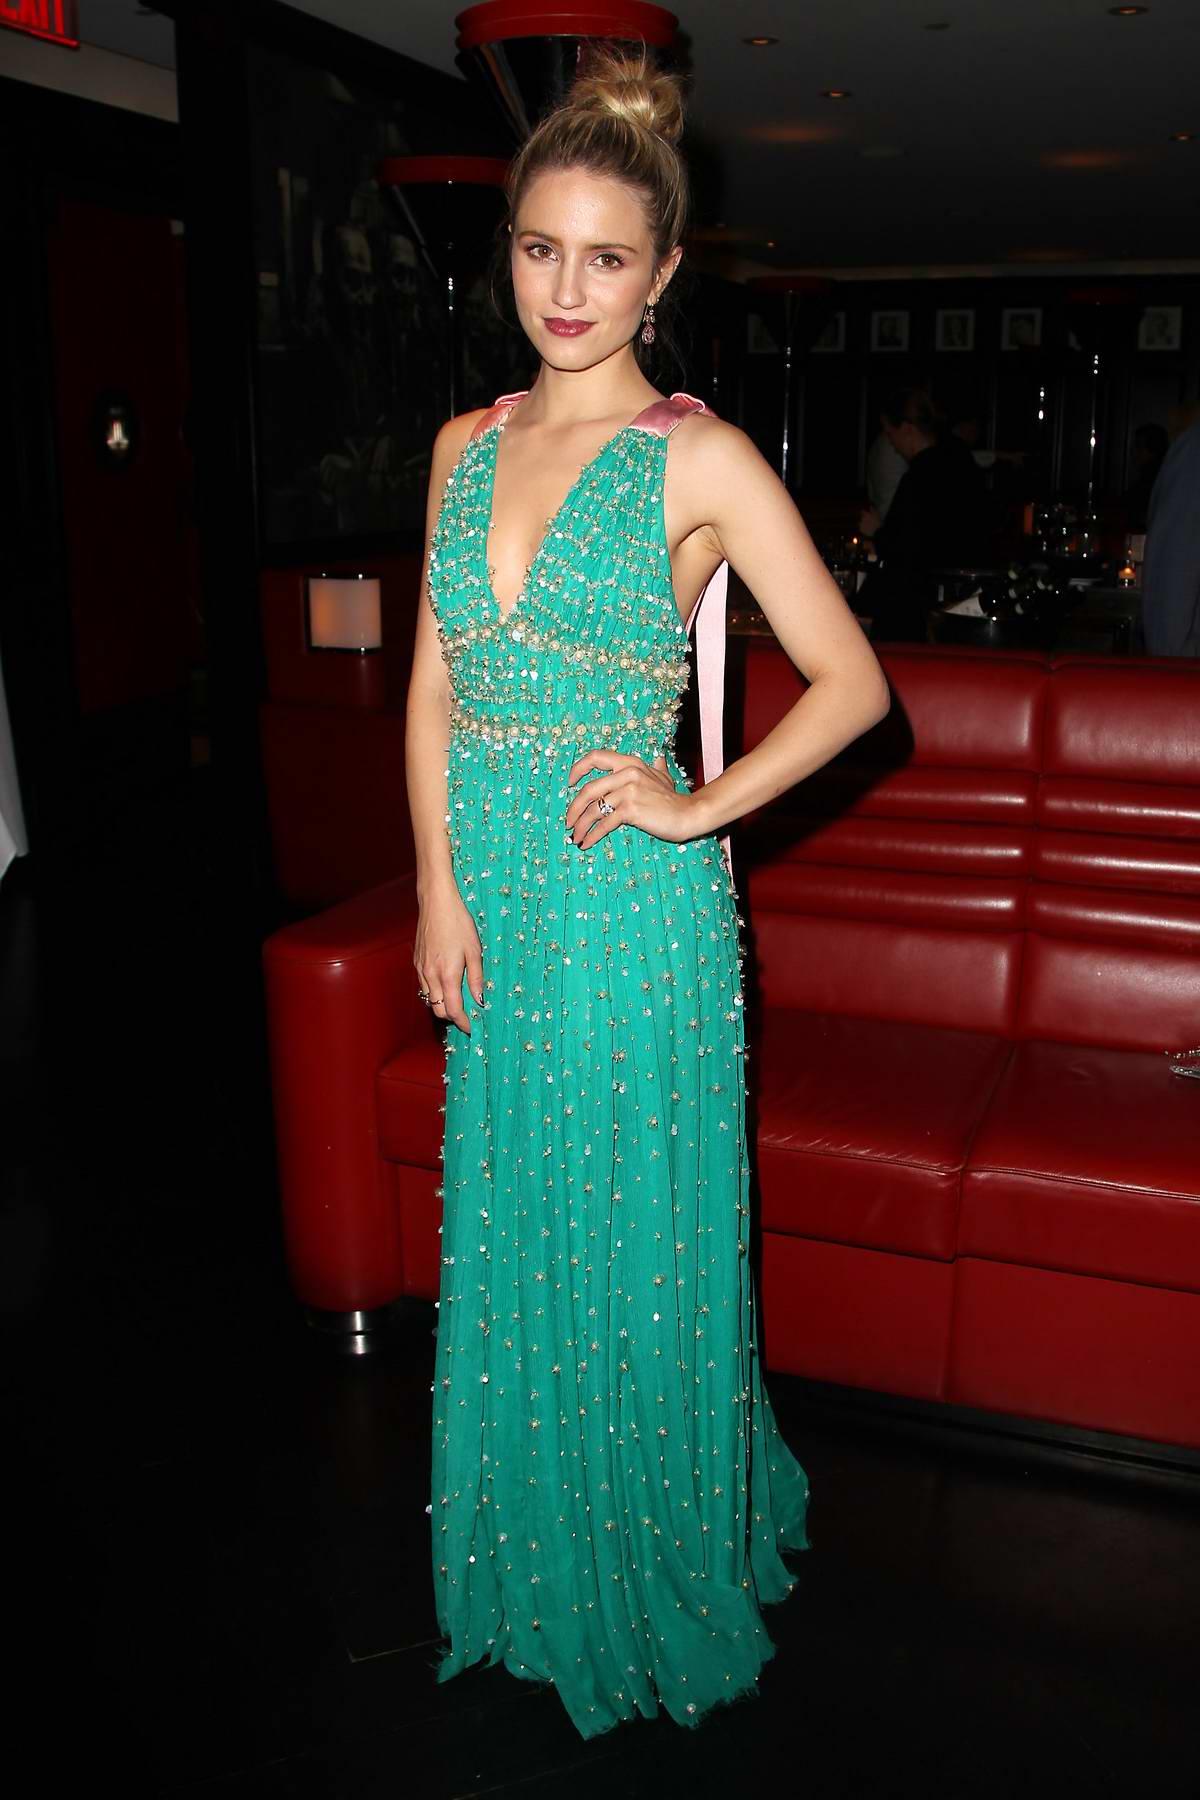 Dianna Agron at the 'Novitiate' film screening in New York